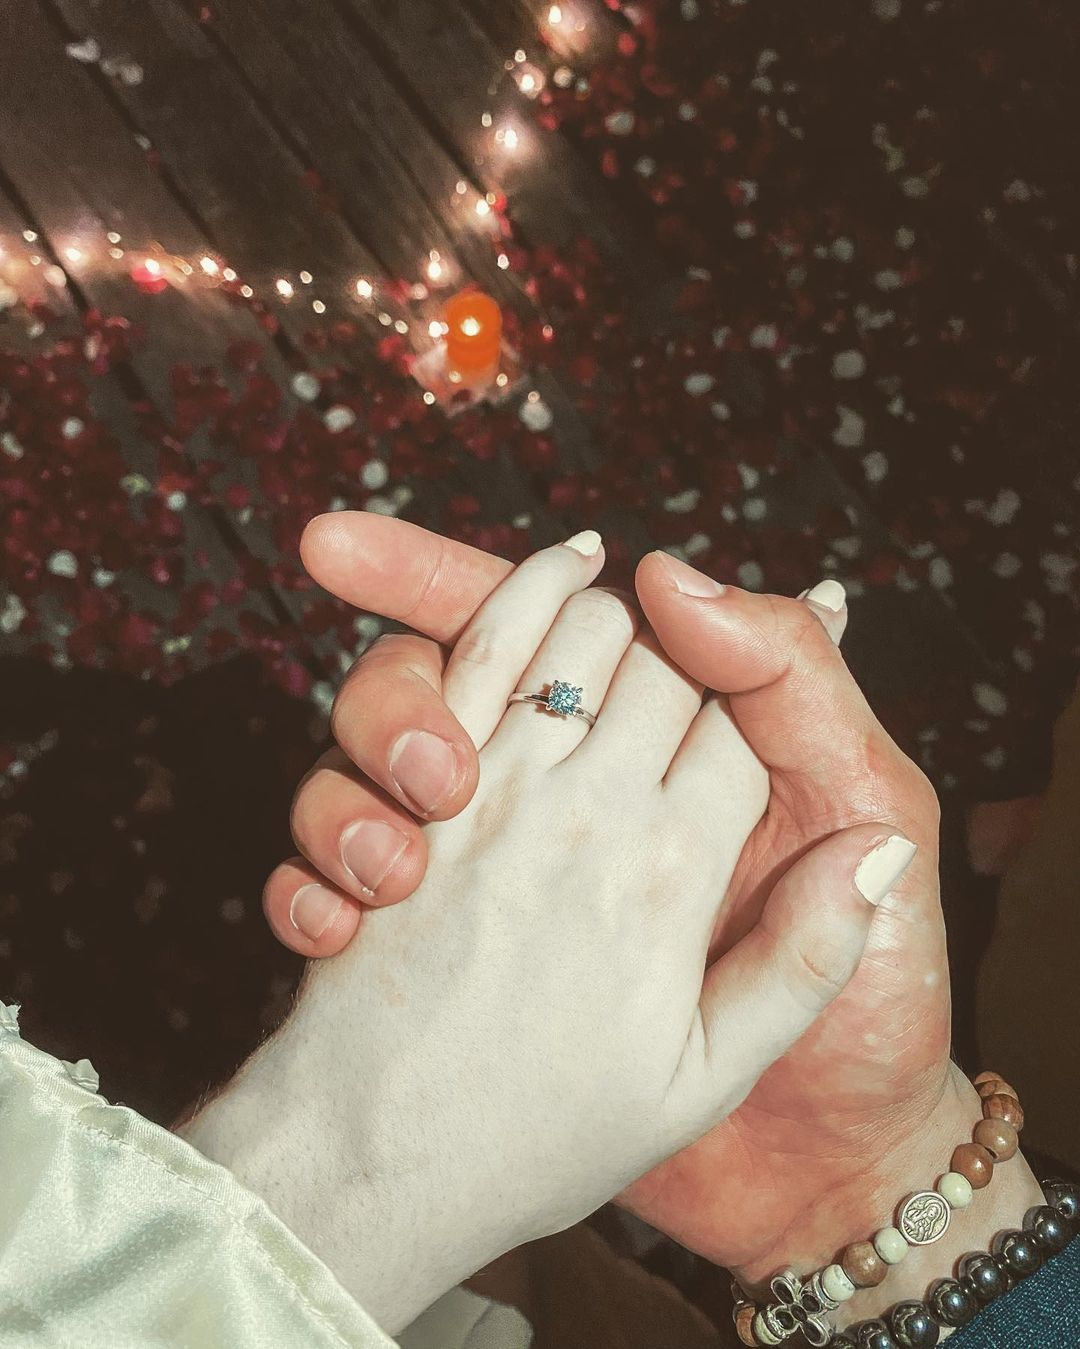 Sophie Albert's pale hand